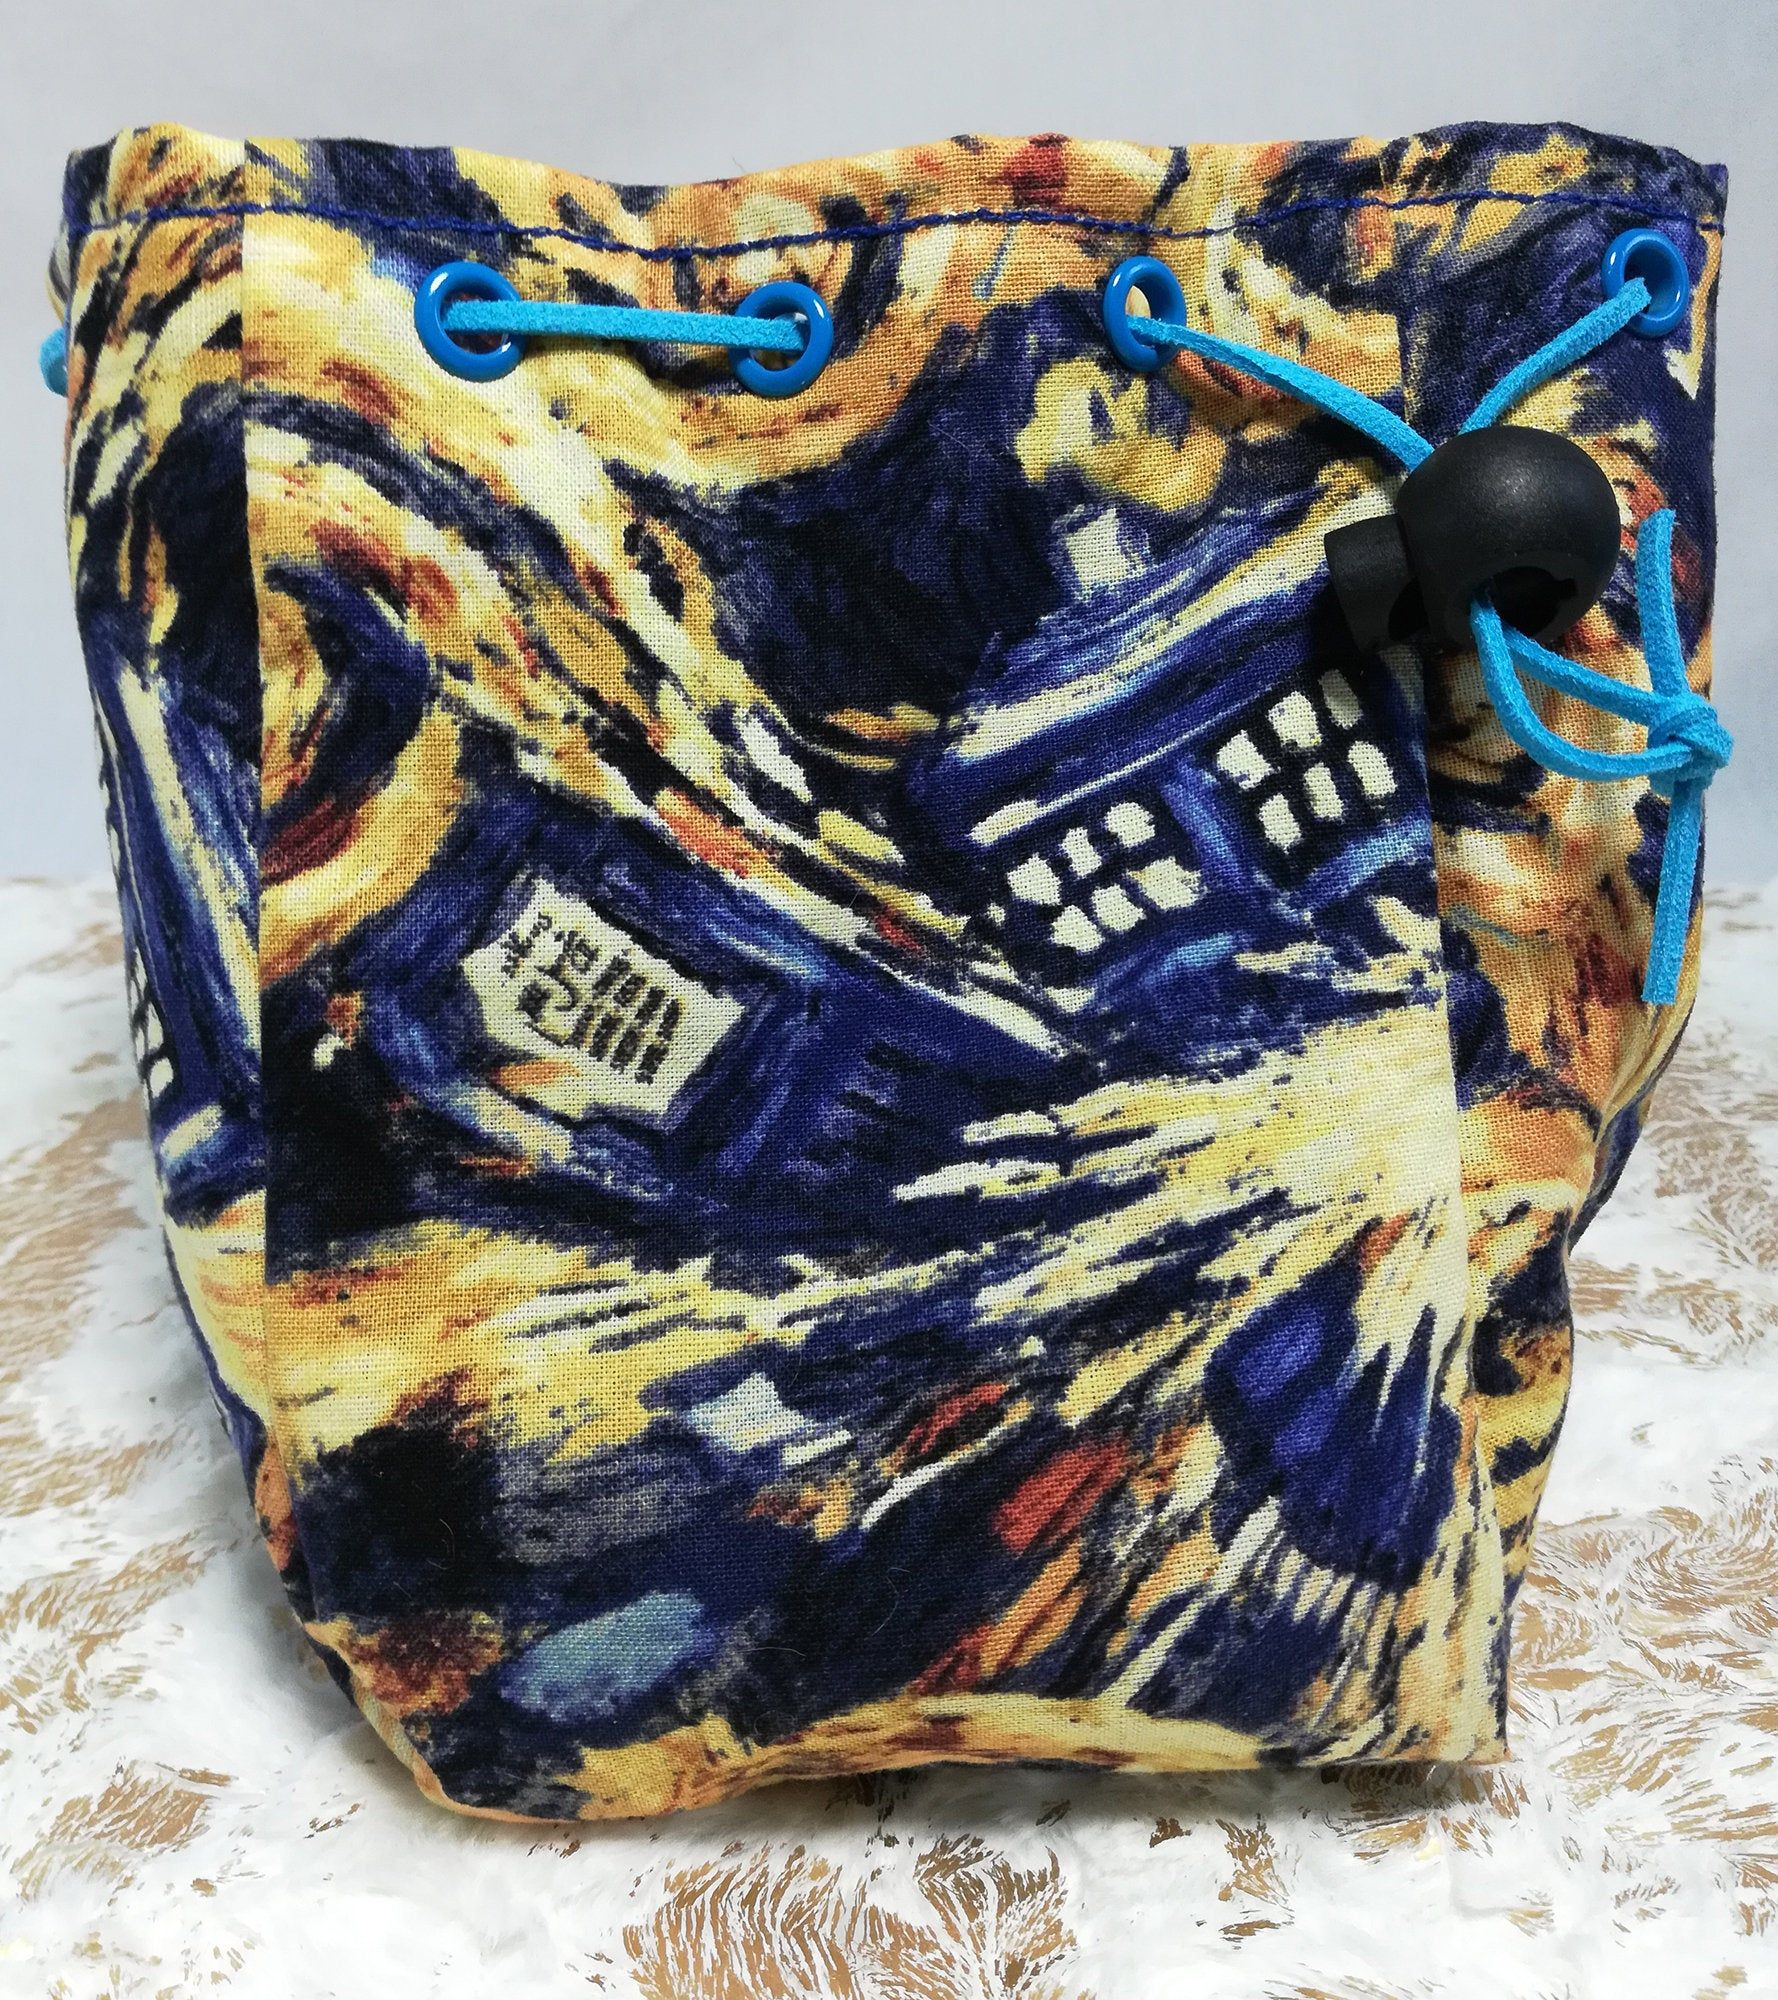 Dice Bag Marble Bag A Game of Drawstring Bags Cotton Drawstring Bag Drawstring Pouch